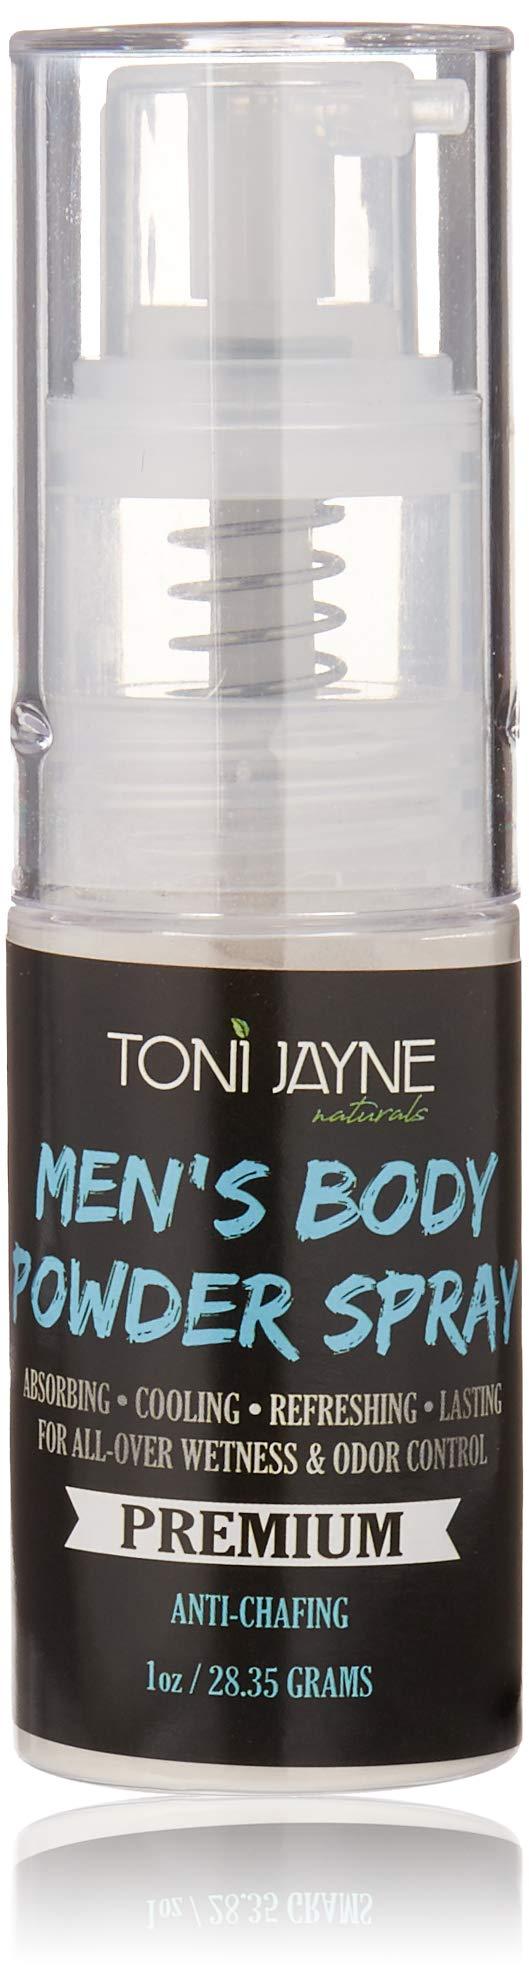 Men's Body Powder Spray by Toni Jayne Naturals: Fresh Aloe Vera Body Spray for Men| Full Body Cooling & Odor Control Spray|Natural Anti-Sweat, Anti-Chafing Body Powder Spray| Non Talc 1oz by Toni Jayne Naturals